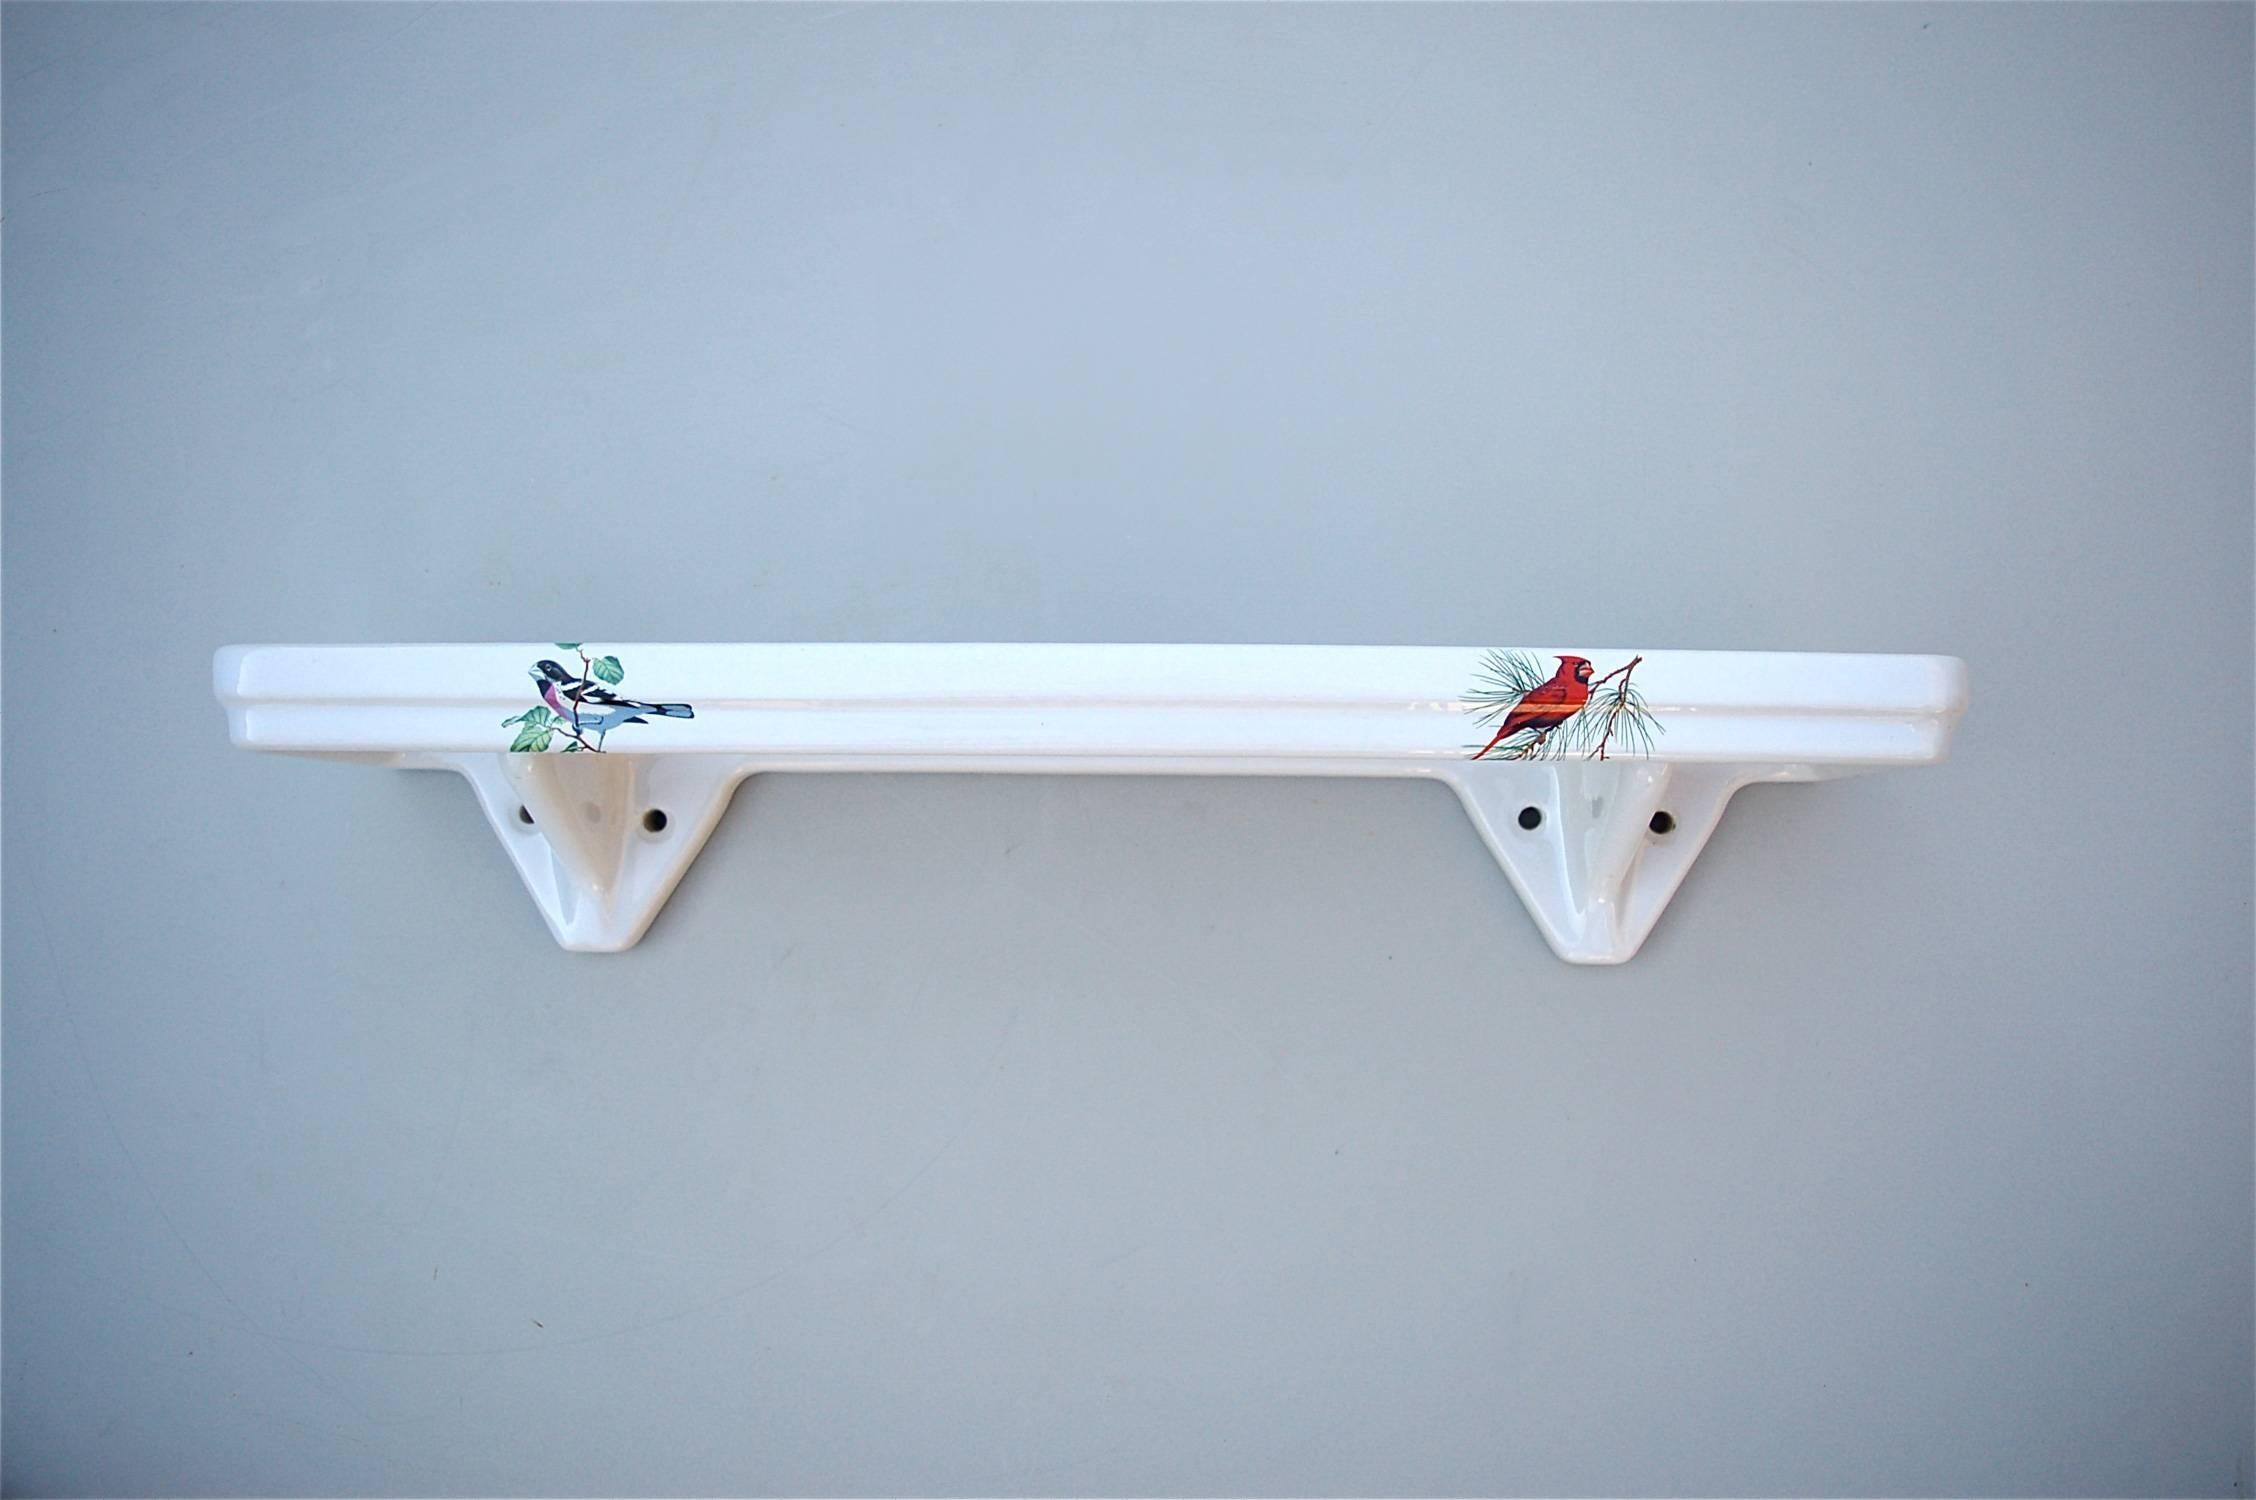 Porcelain Bathroom Vanity Shelf With Bird Decoration